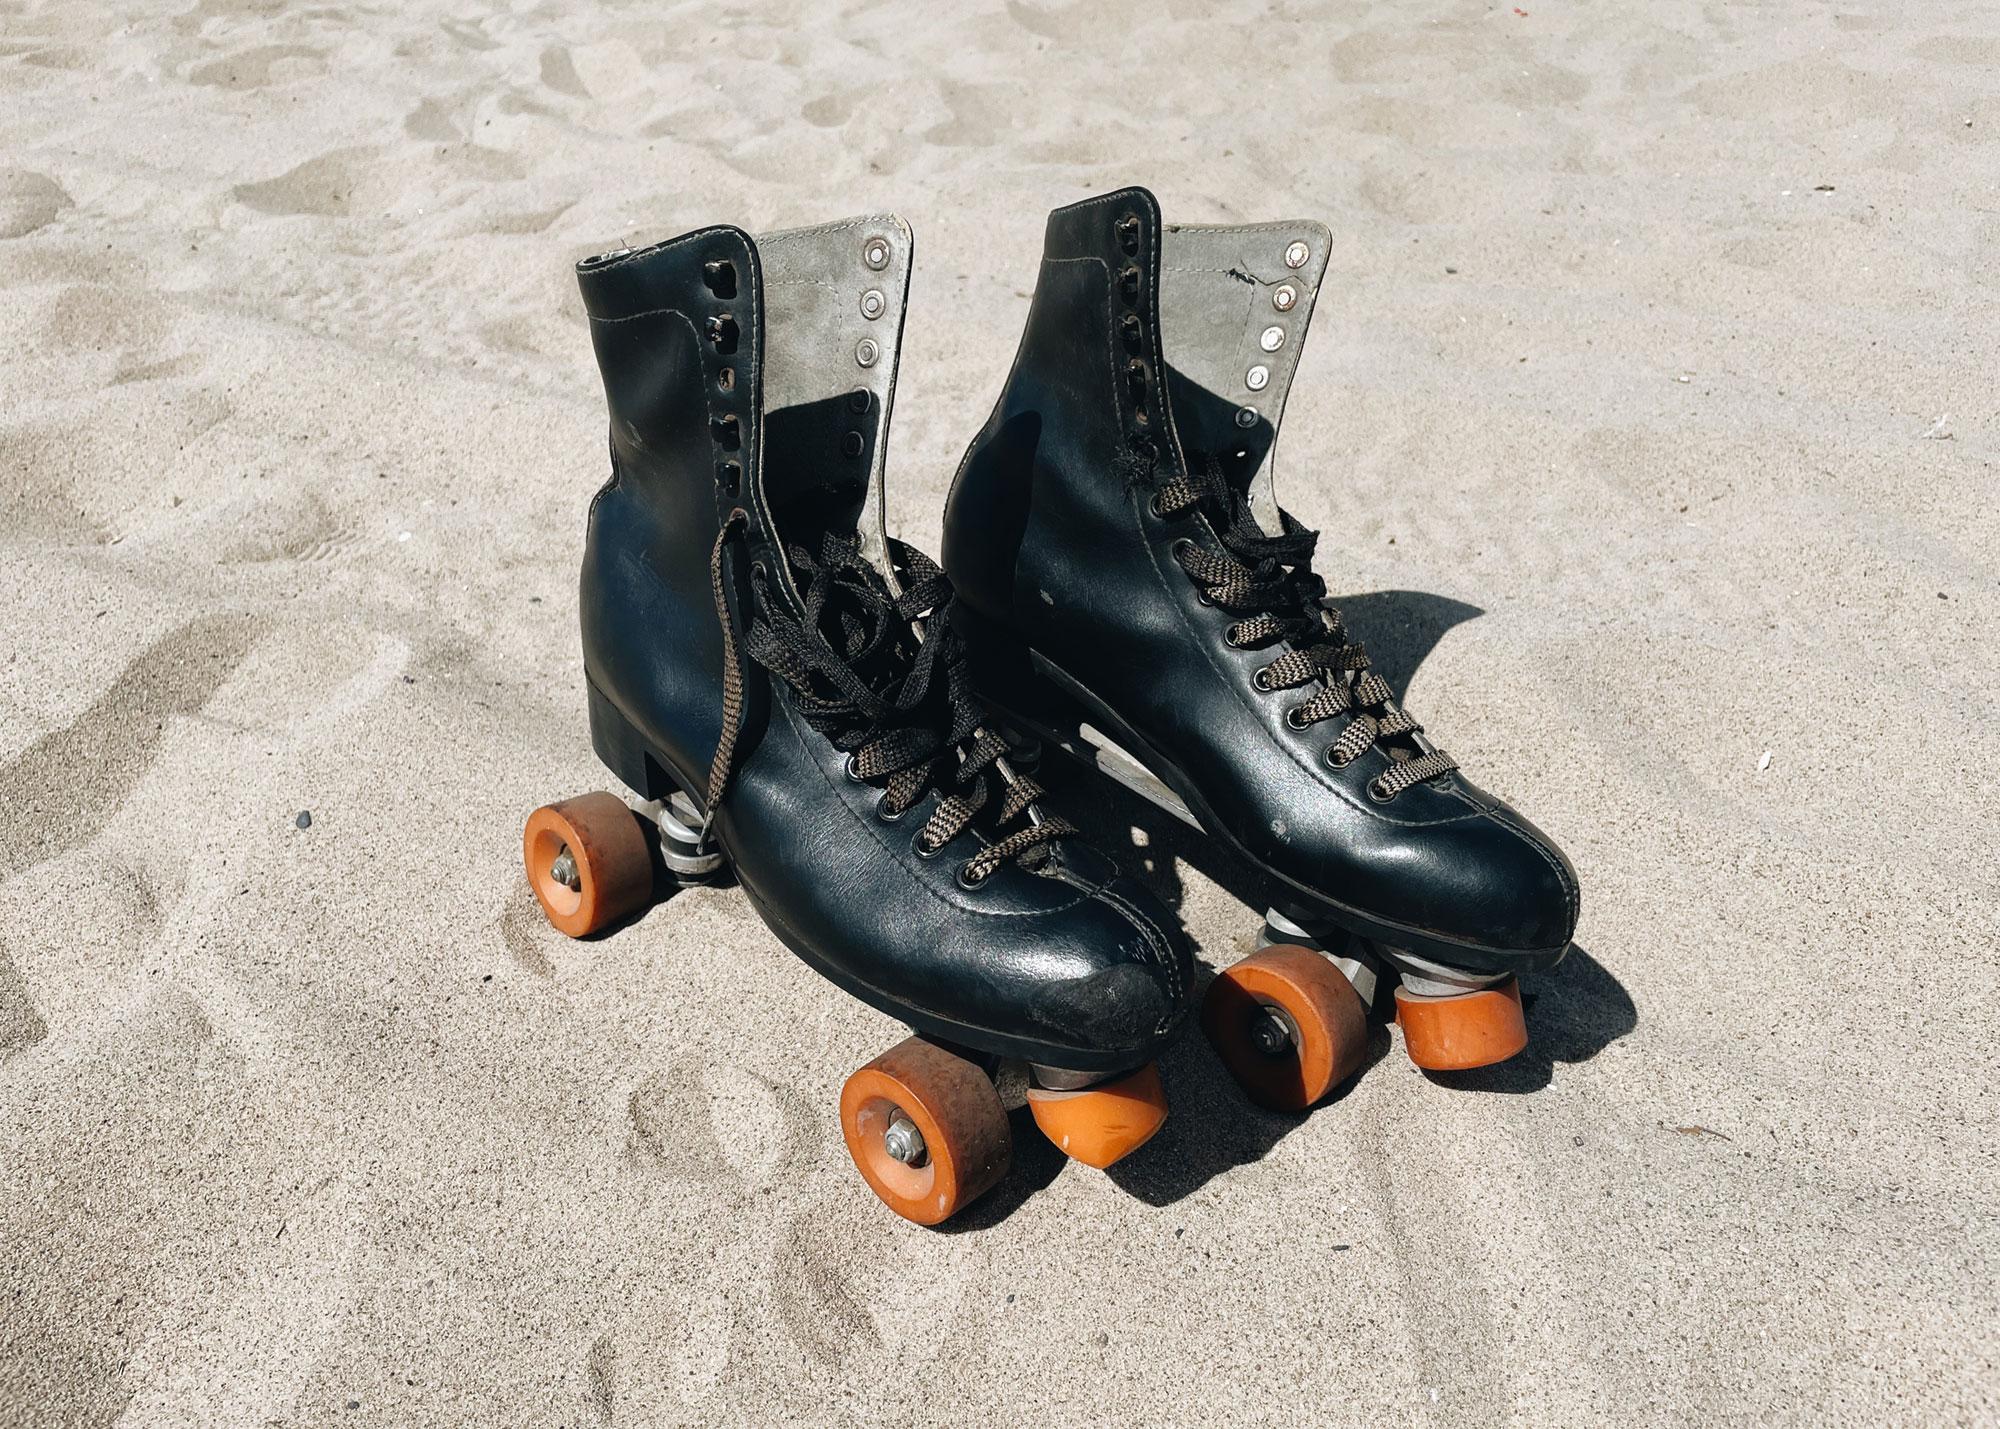 My rollerskates hangin in Santa Monica.